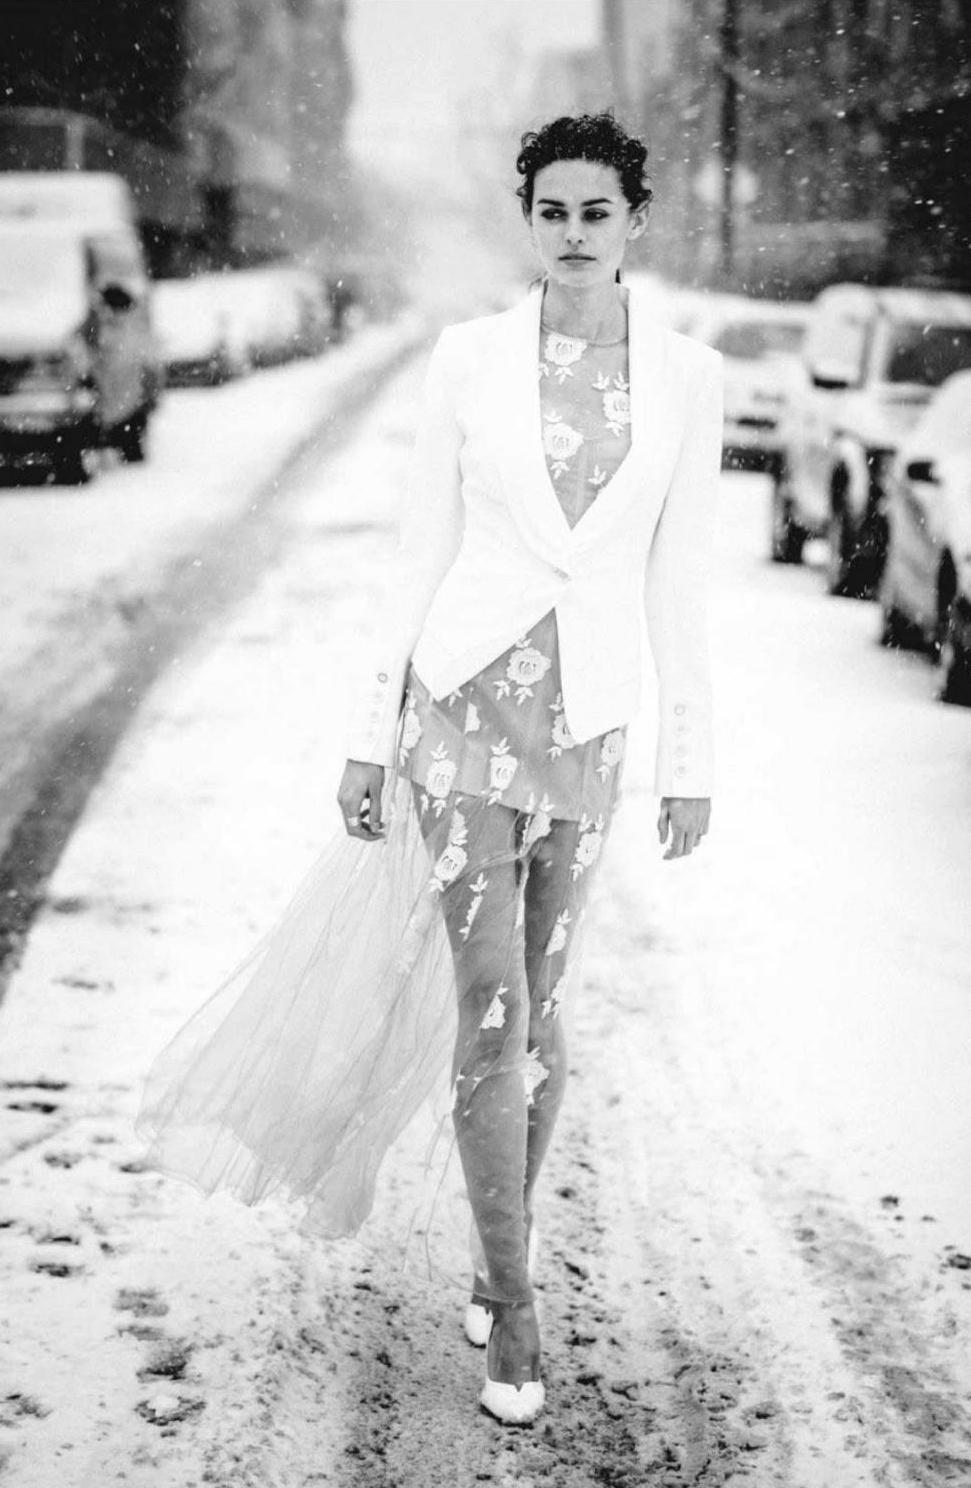 Jenna Klein Duplanty wearing Blumarine lace dress in Amica Italy March 2014 (photography: Jean-Francois Campos, styling: Masha Orlov) via fashioned by love british fashion blog